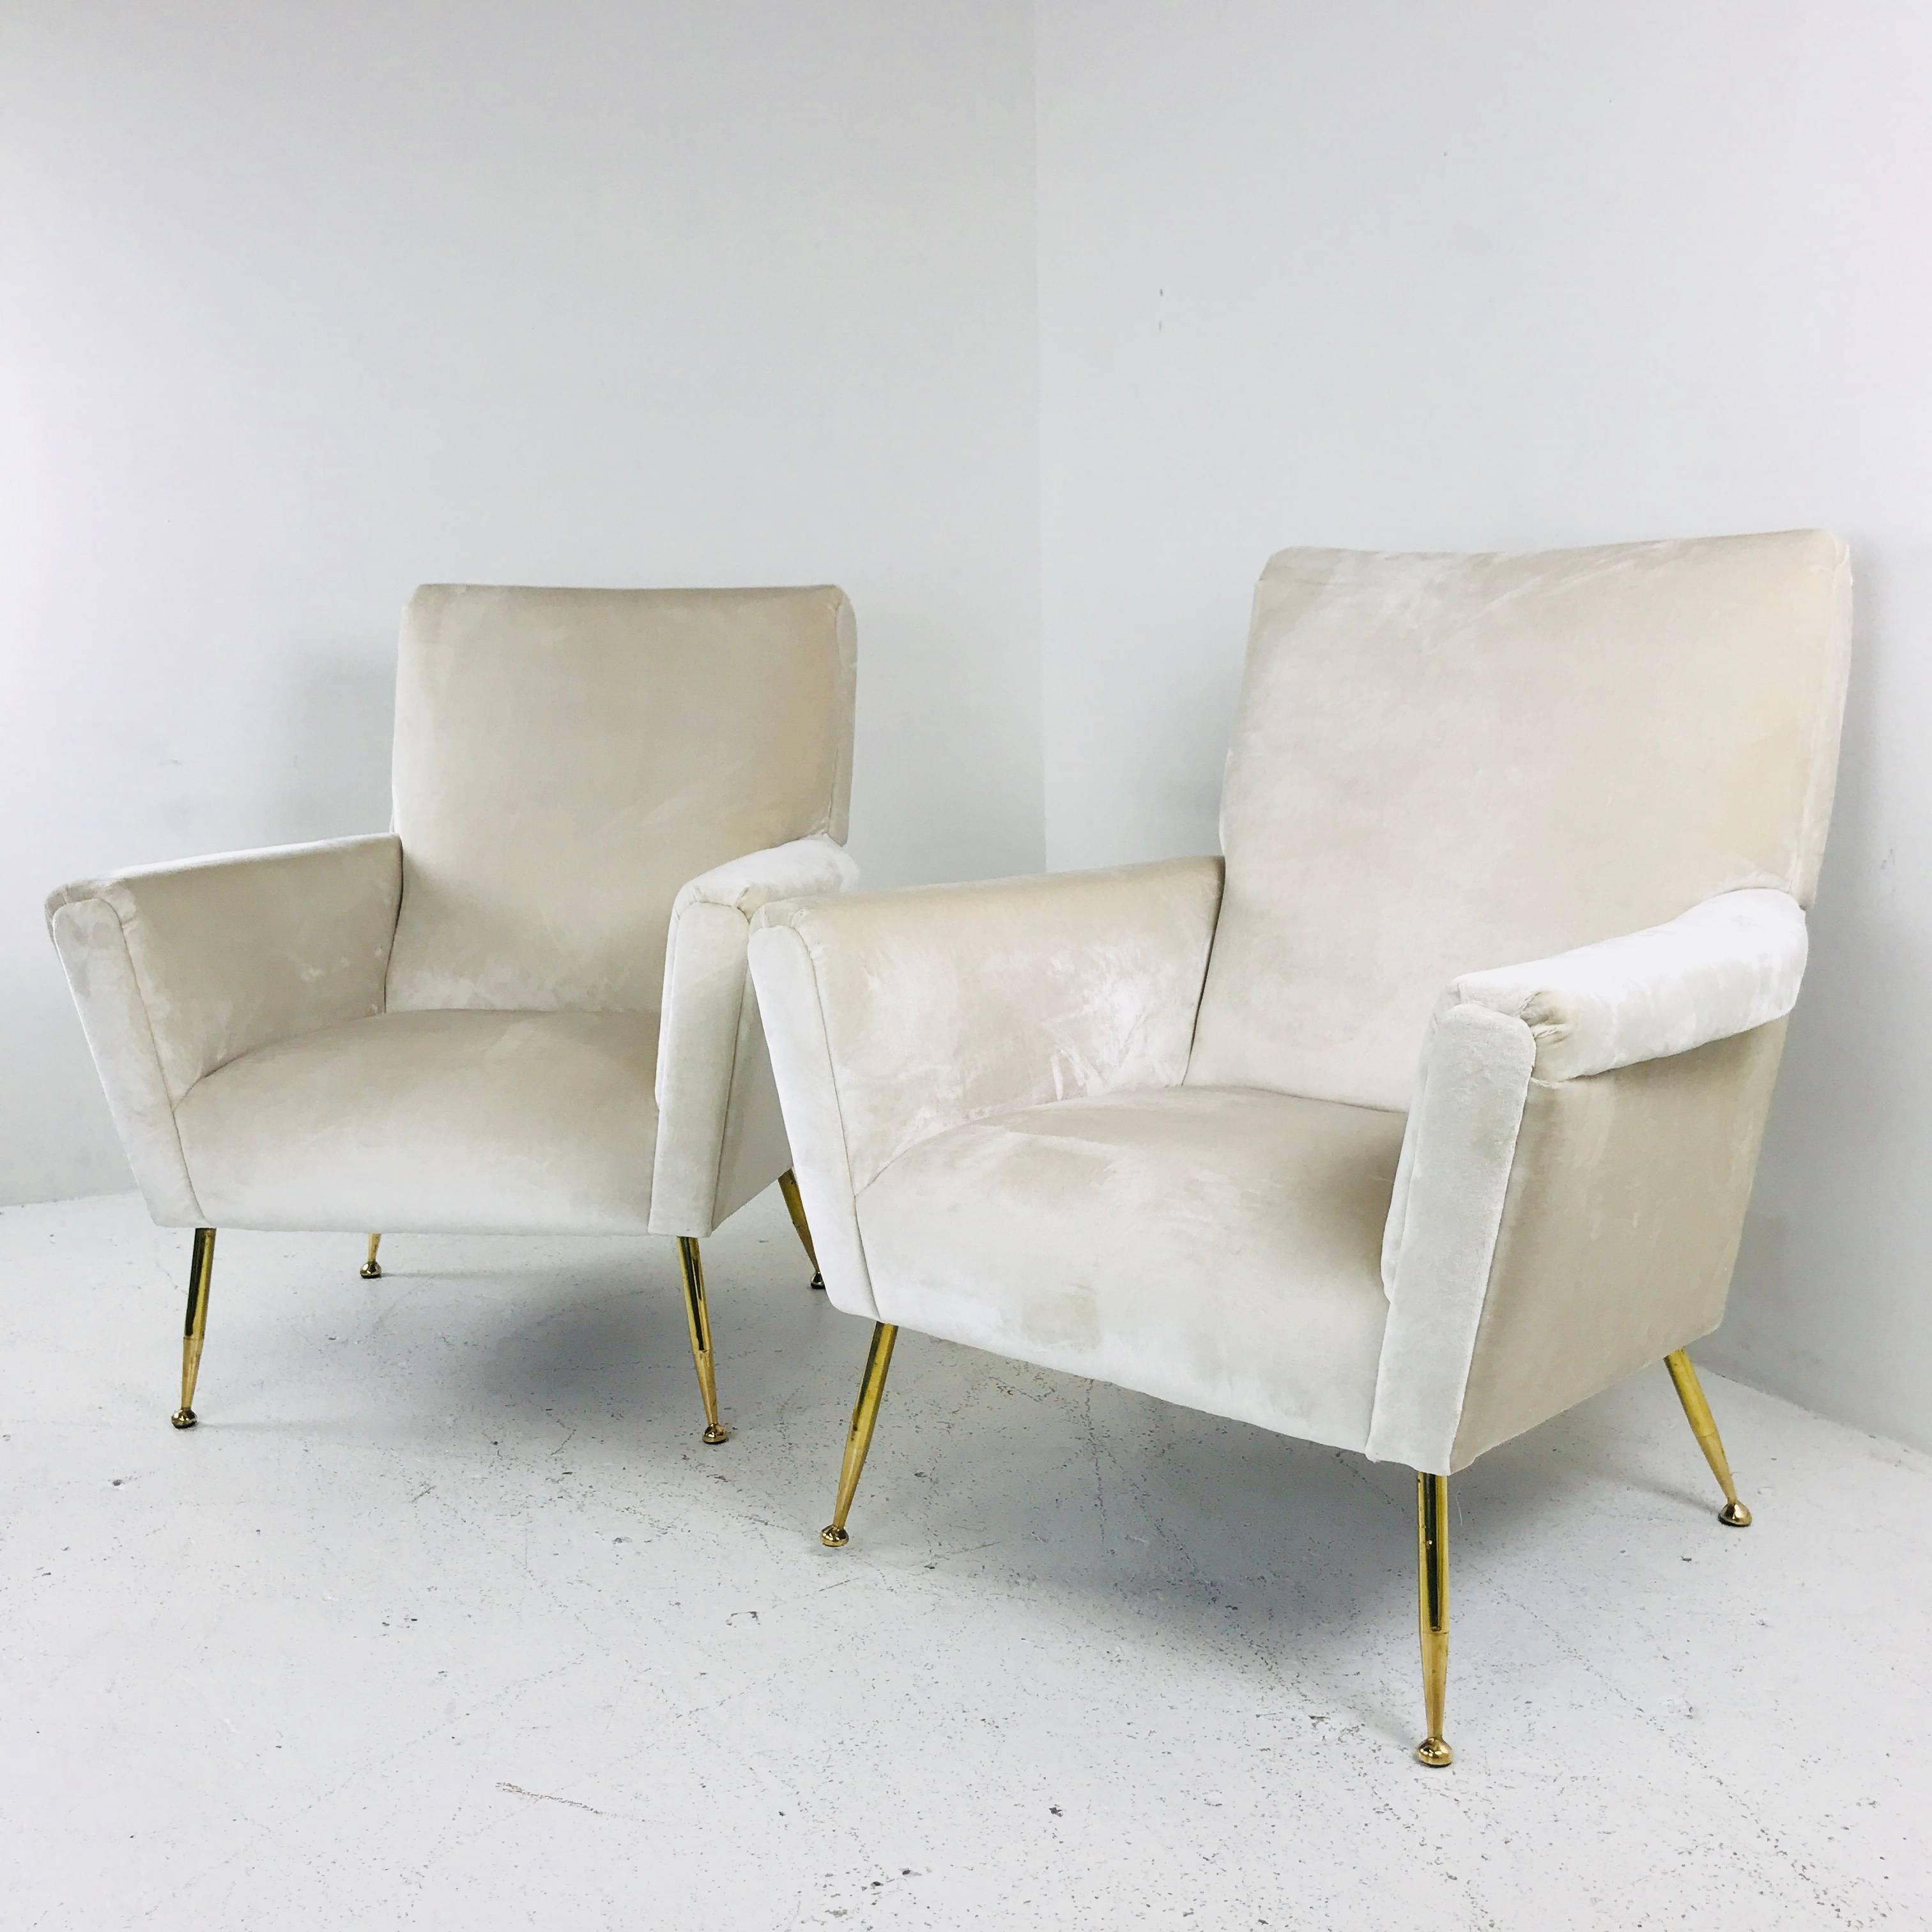 velvet brass stylish armchair chair feet with yellow